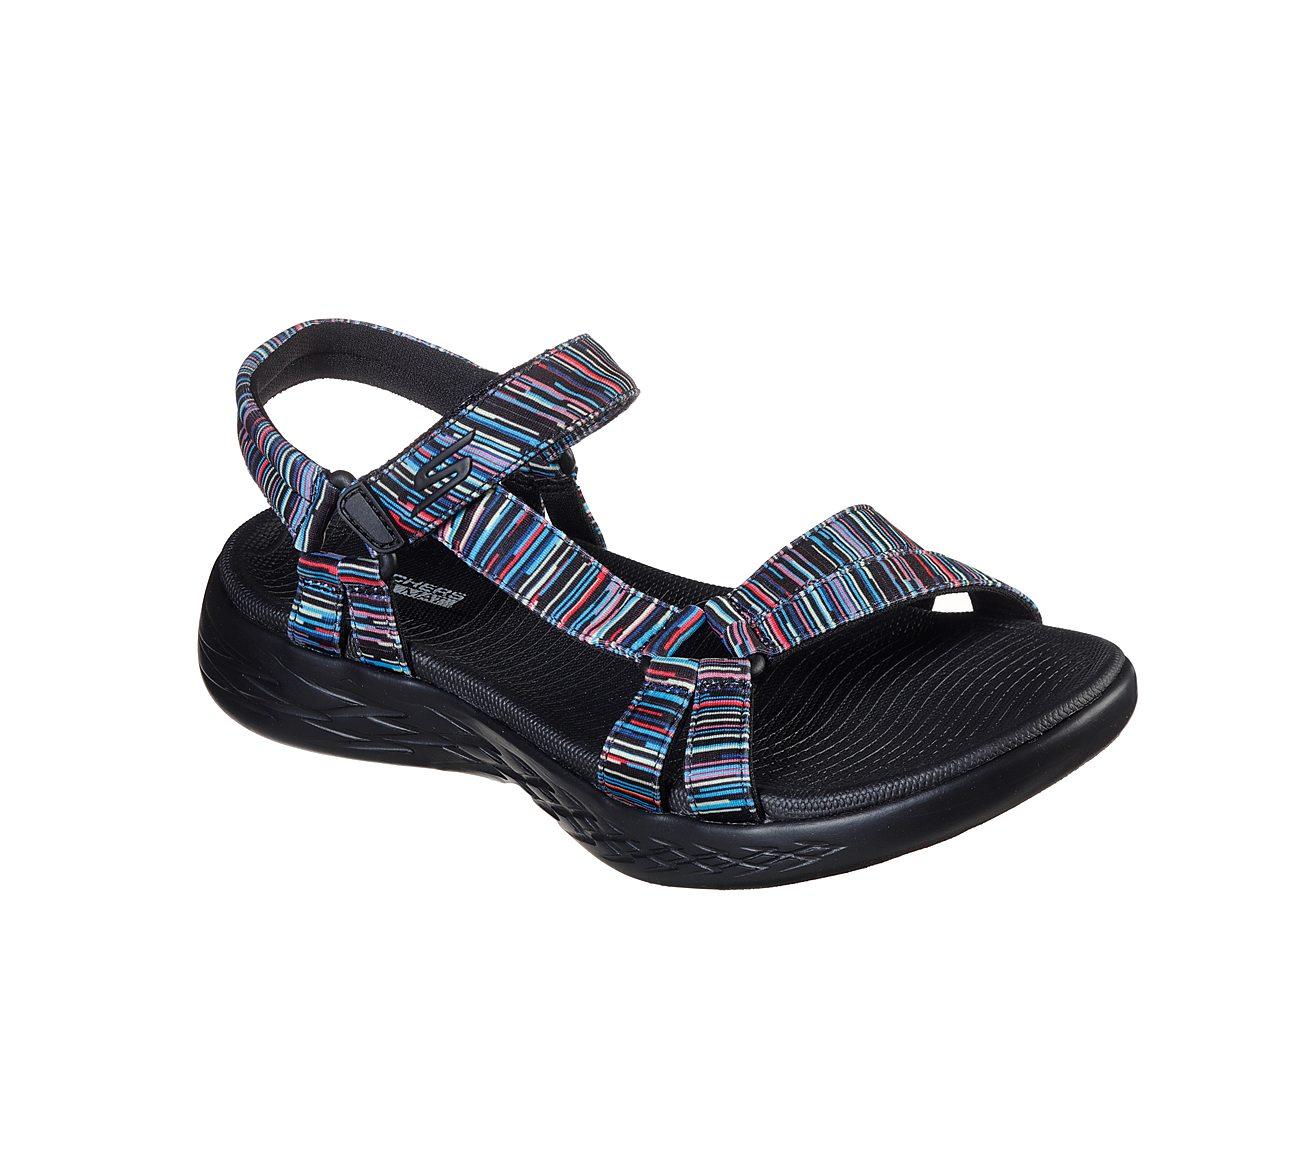 Comprar Skechers On-The-Go 600 Sandals - Electric Black